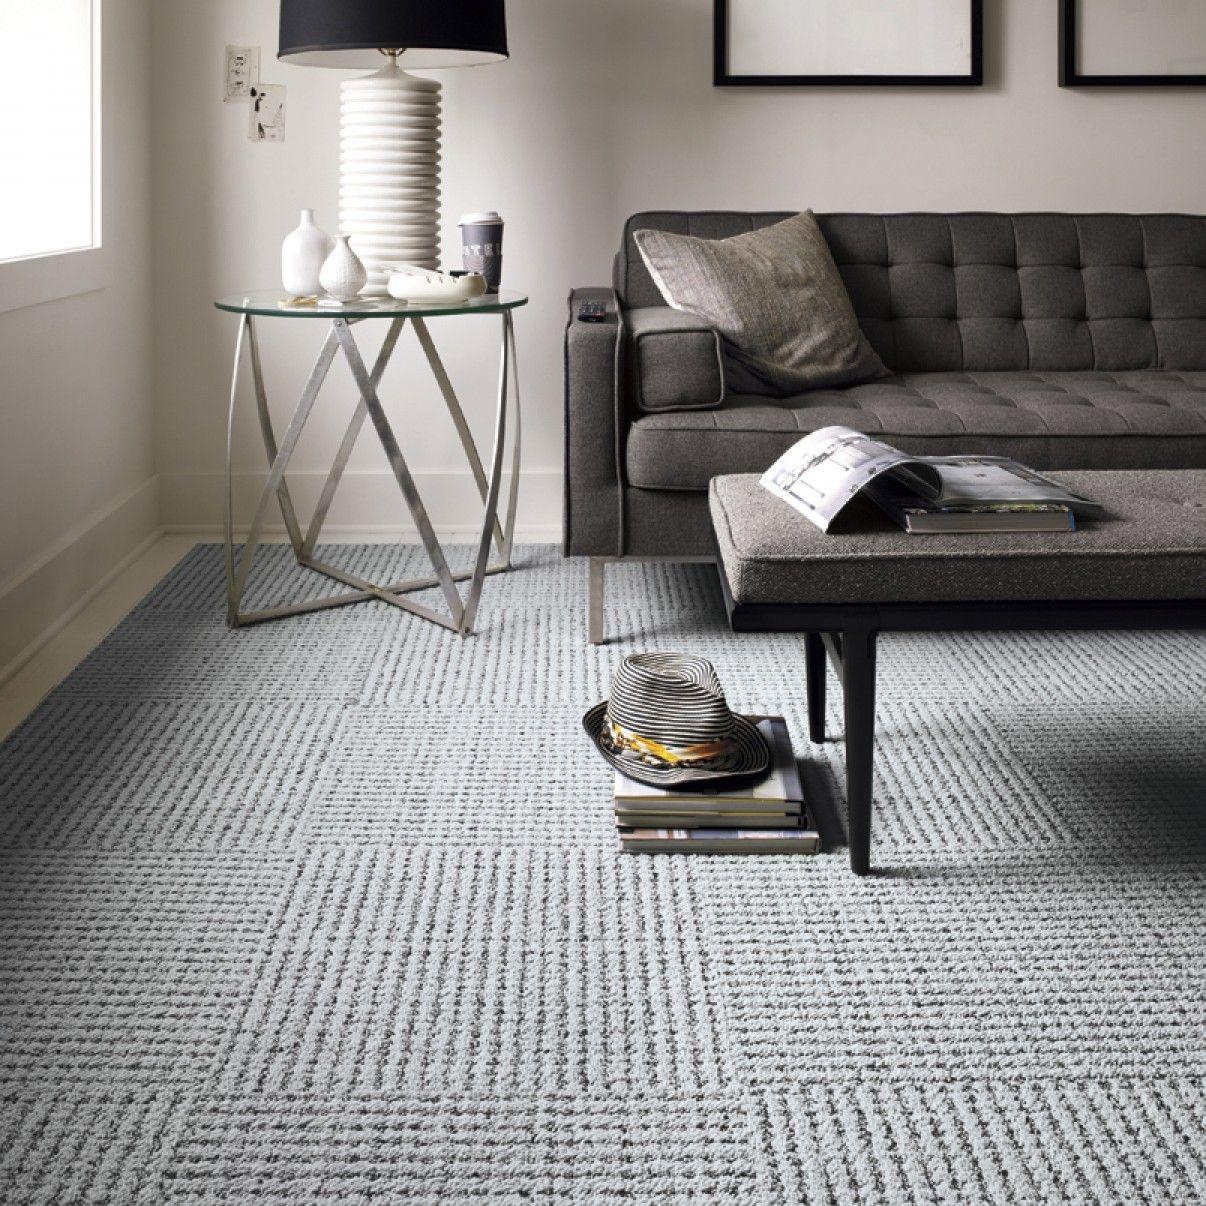 Flor Carpet Tiles Love This Chunky Gray Pattern For Boys Room